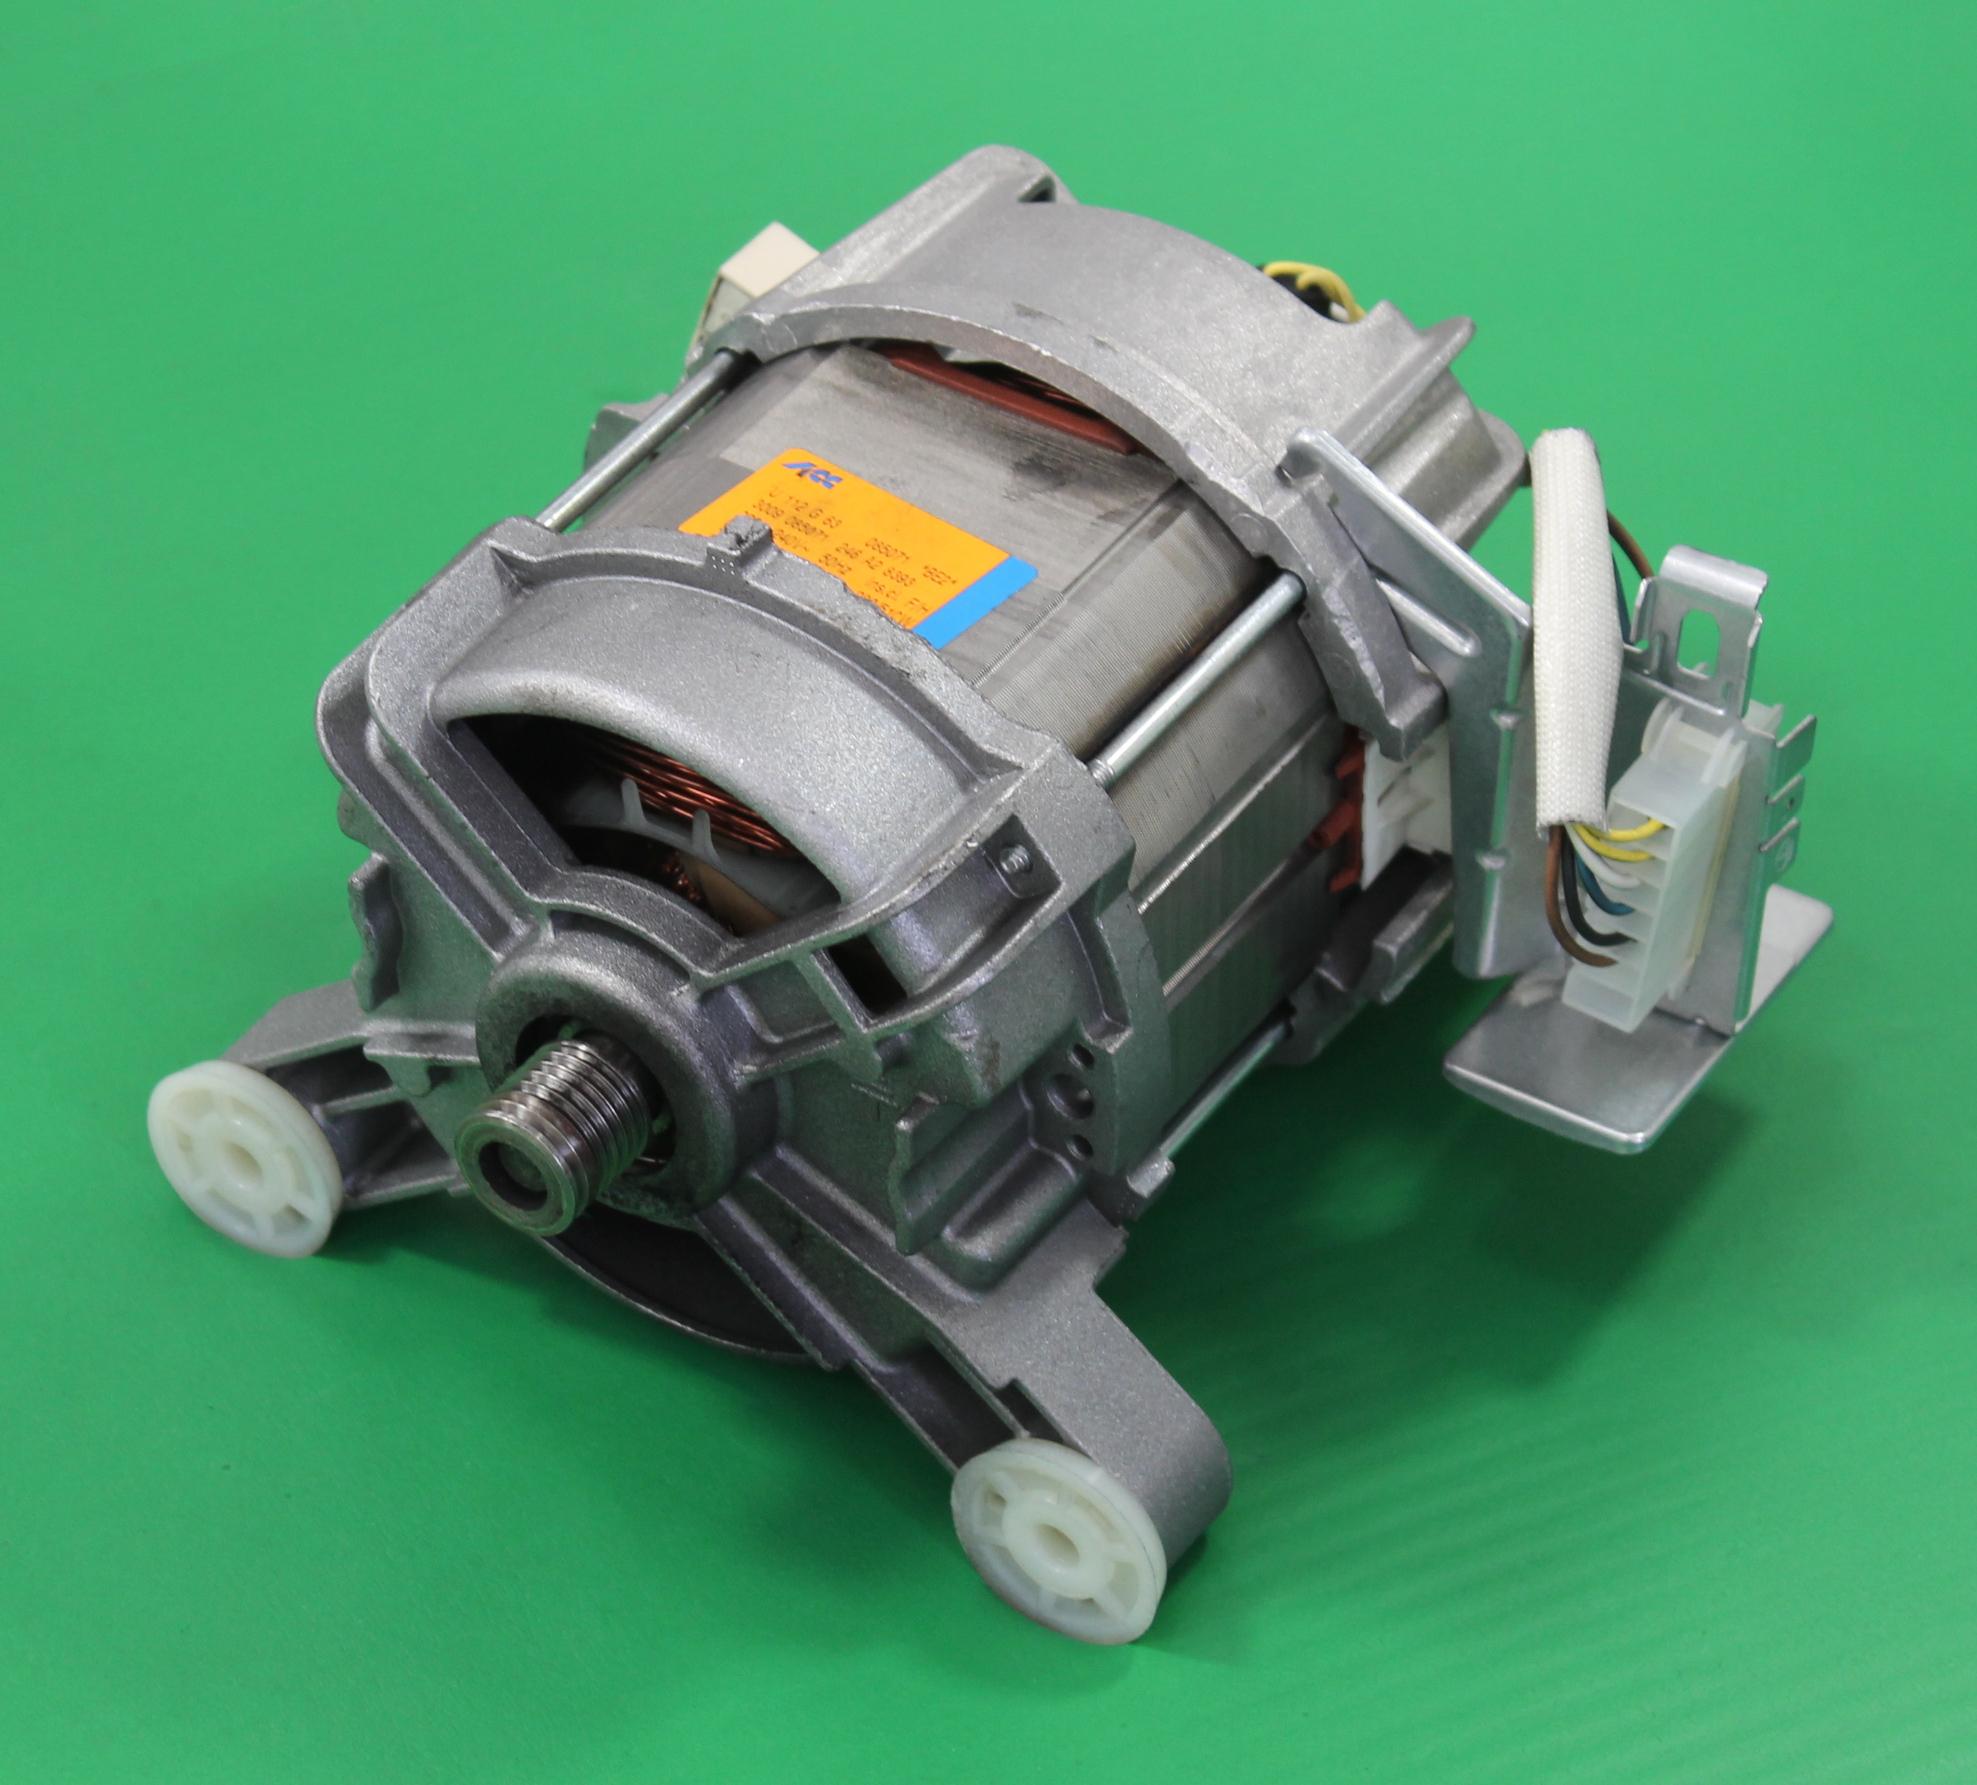 hight resolution of bosch wae24468gb washing machine motor acc u 112 g 63 frigidaire washing machine bosch classixx washing machine wiring diagram